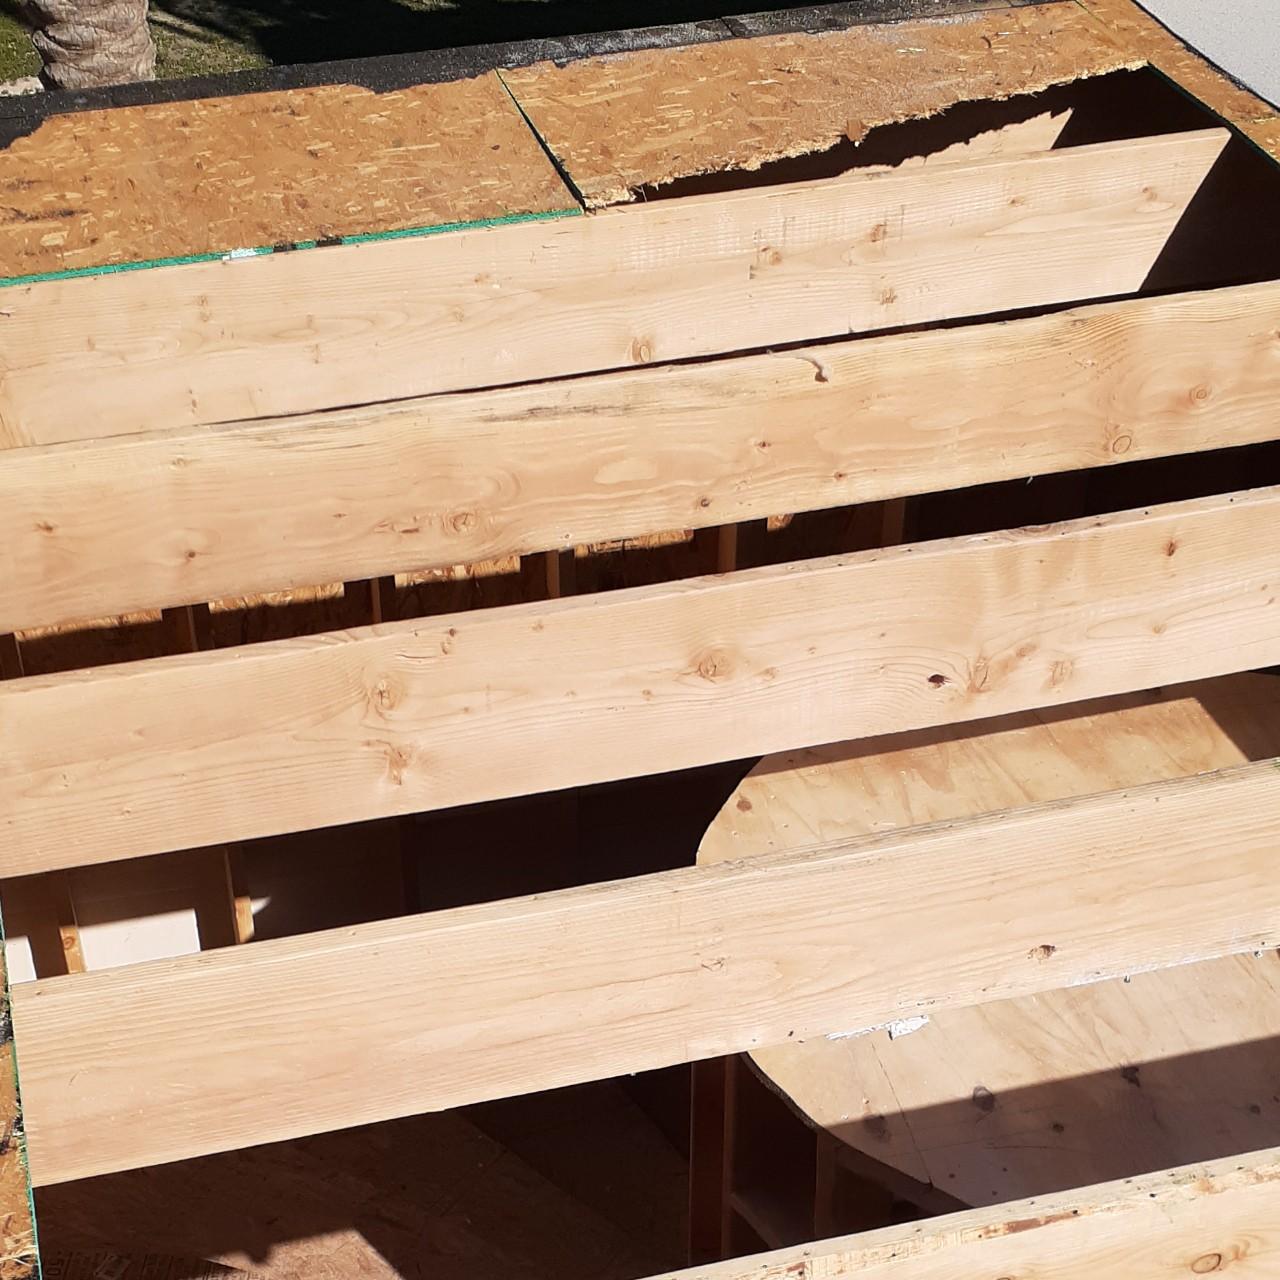 carpentry-wood-framing-second-floor-home-addition--framing-52